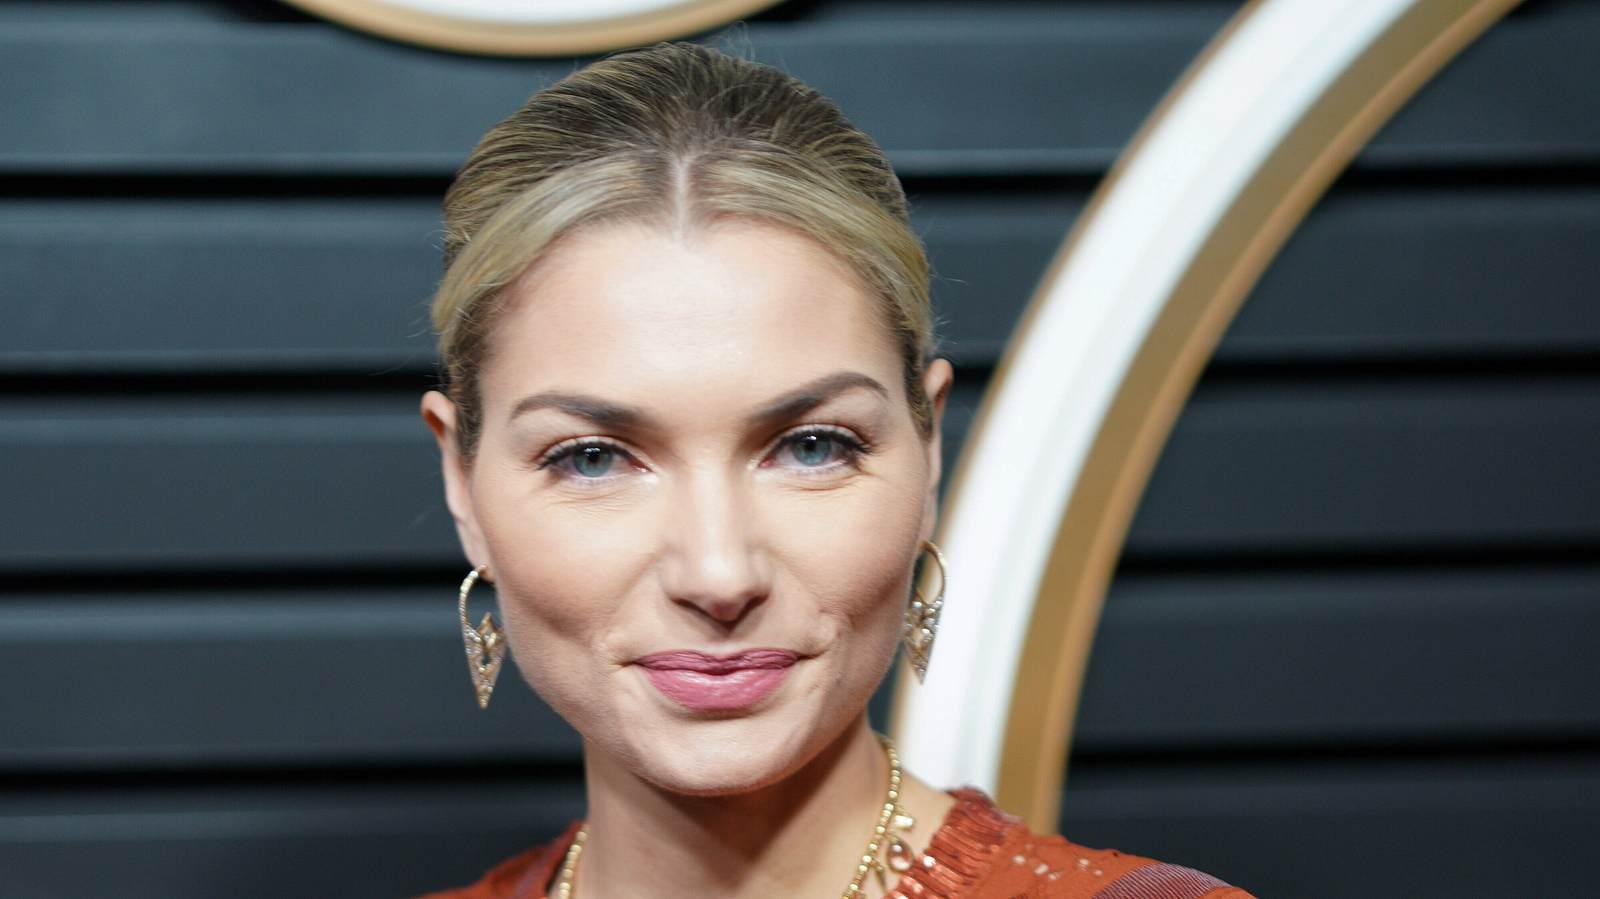 Nackt Antonia Hemmer  sucht Nacktmodel